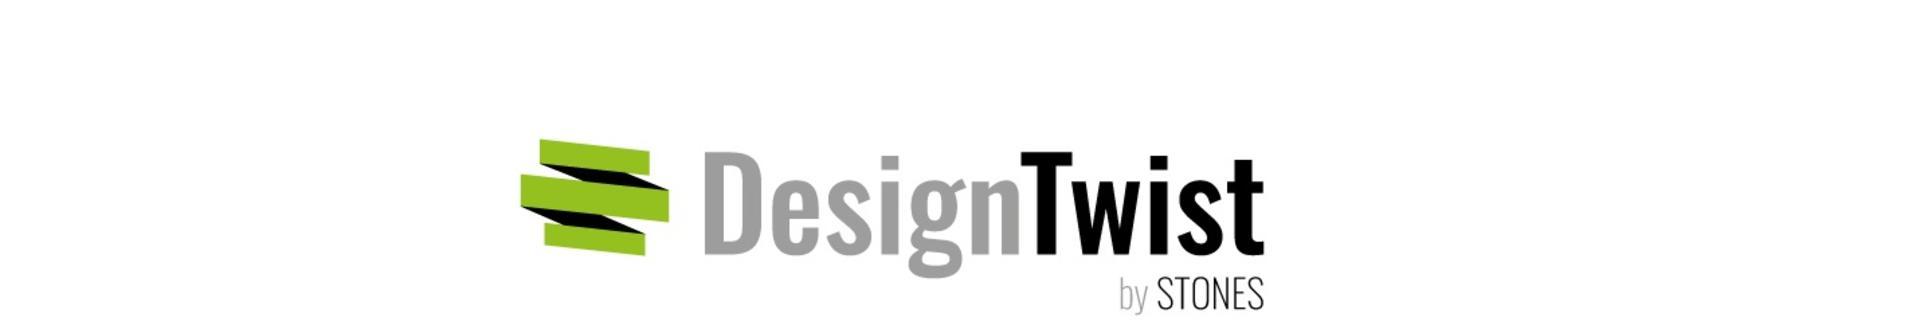 Logo twist 2 2